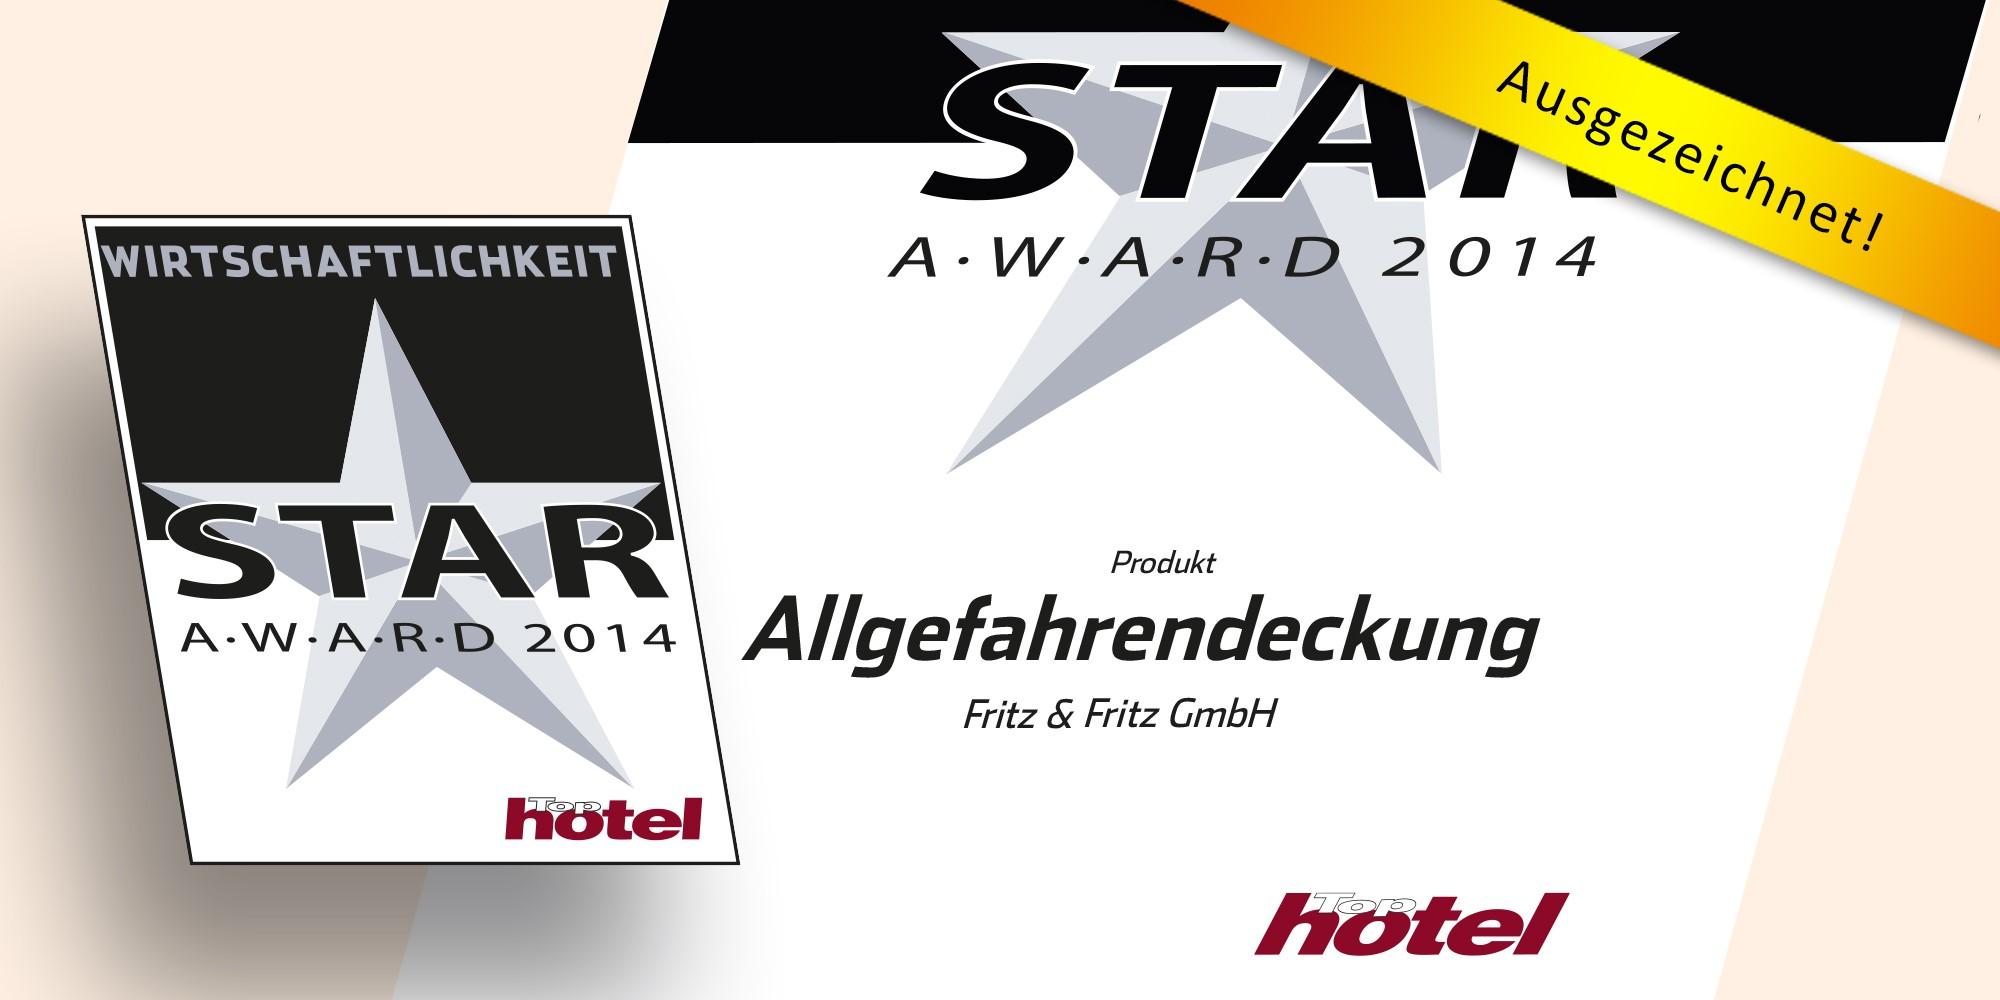 All-Risk Hotel » Fritz & Fritz